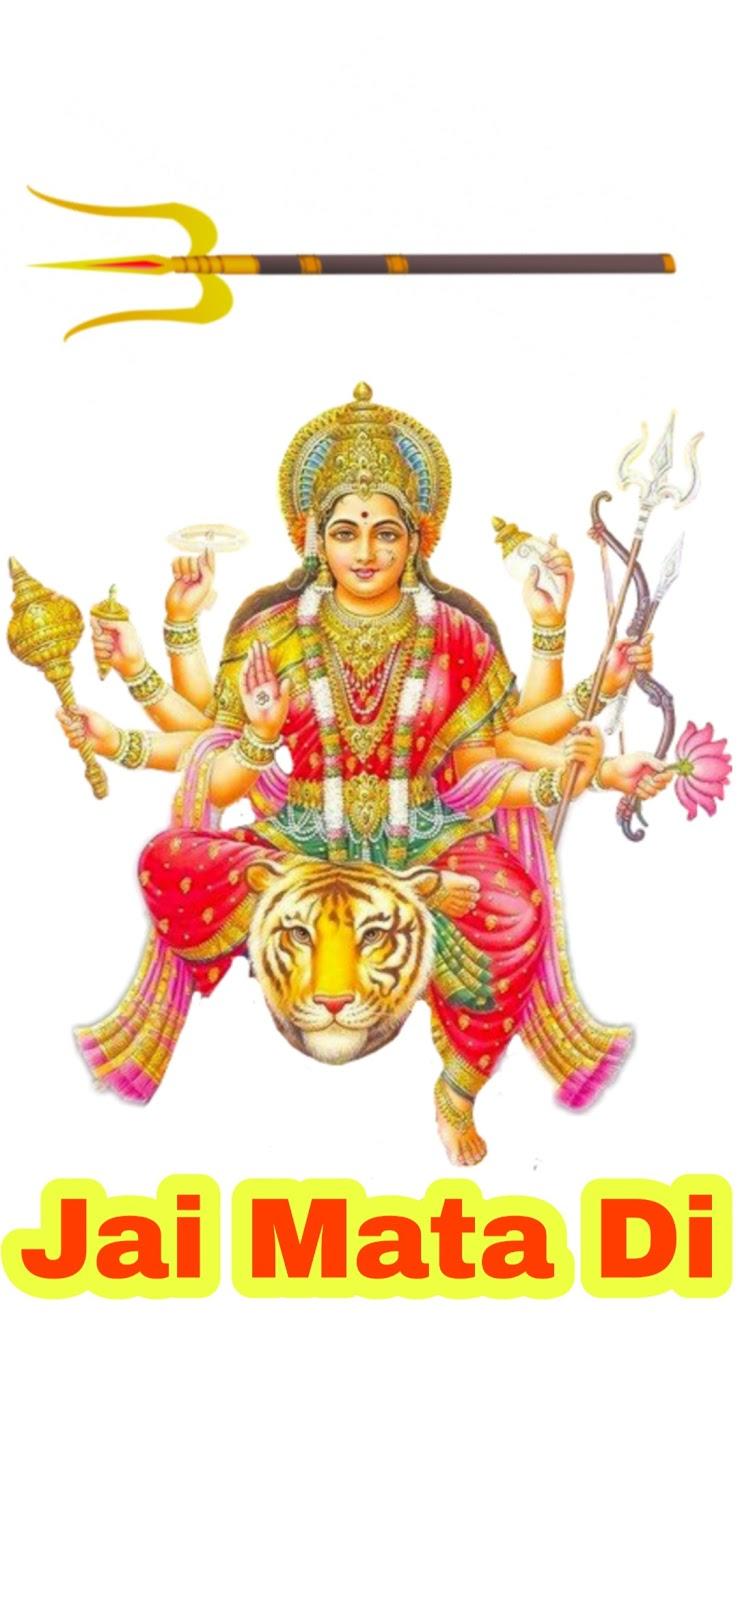 म द र ग म ब इल व लप पर Hd Maa Durga Wallpaper Mobile Durga Ji Wallpapers Durga Ji Ki Photo Vhoriginal Com